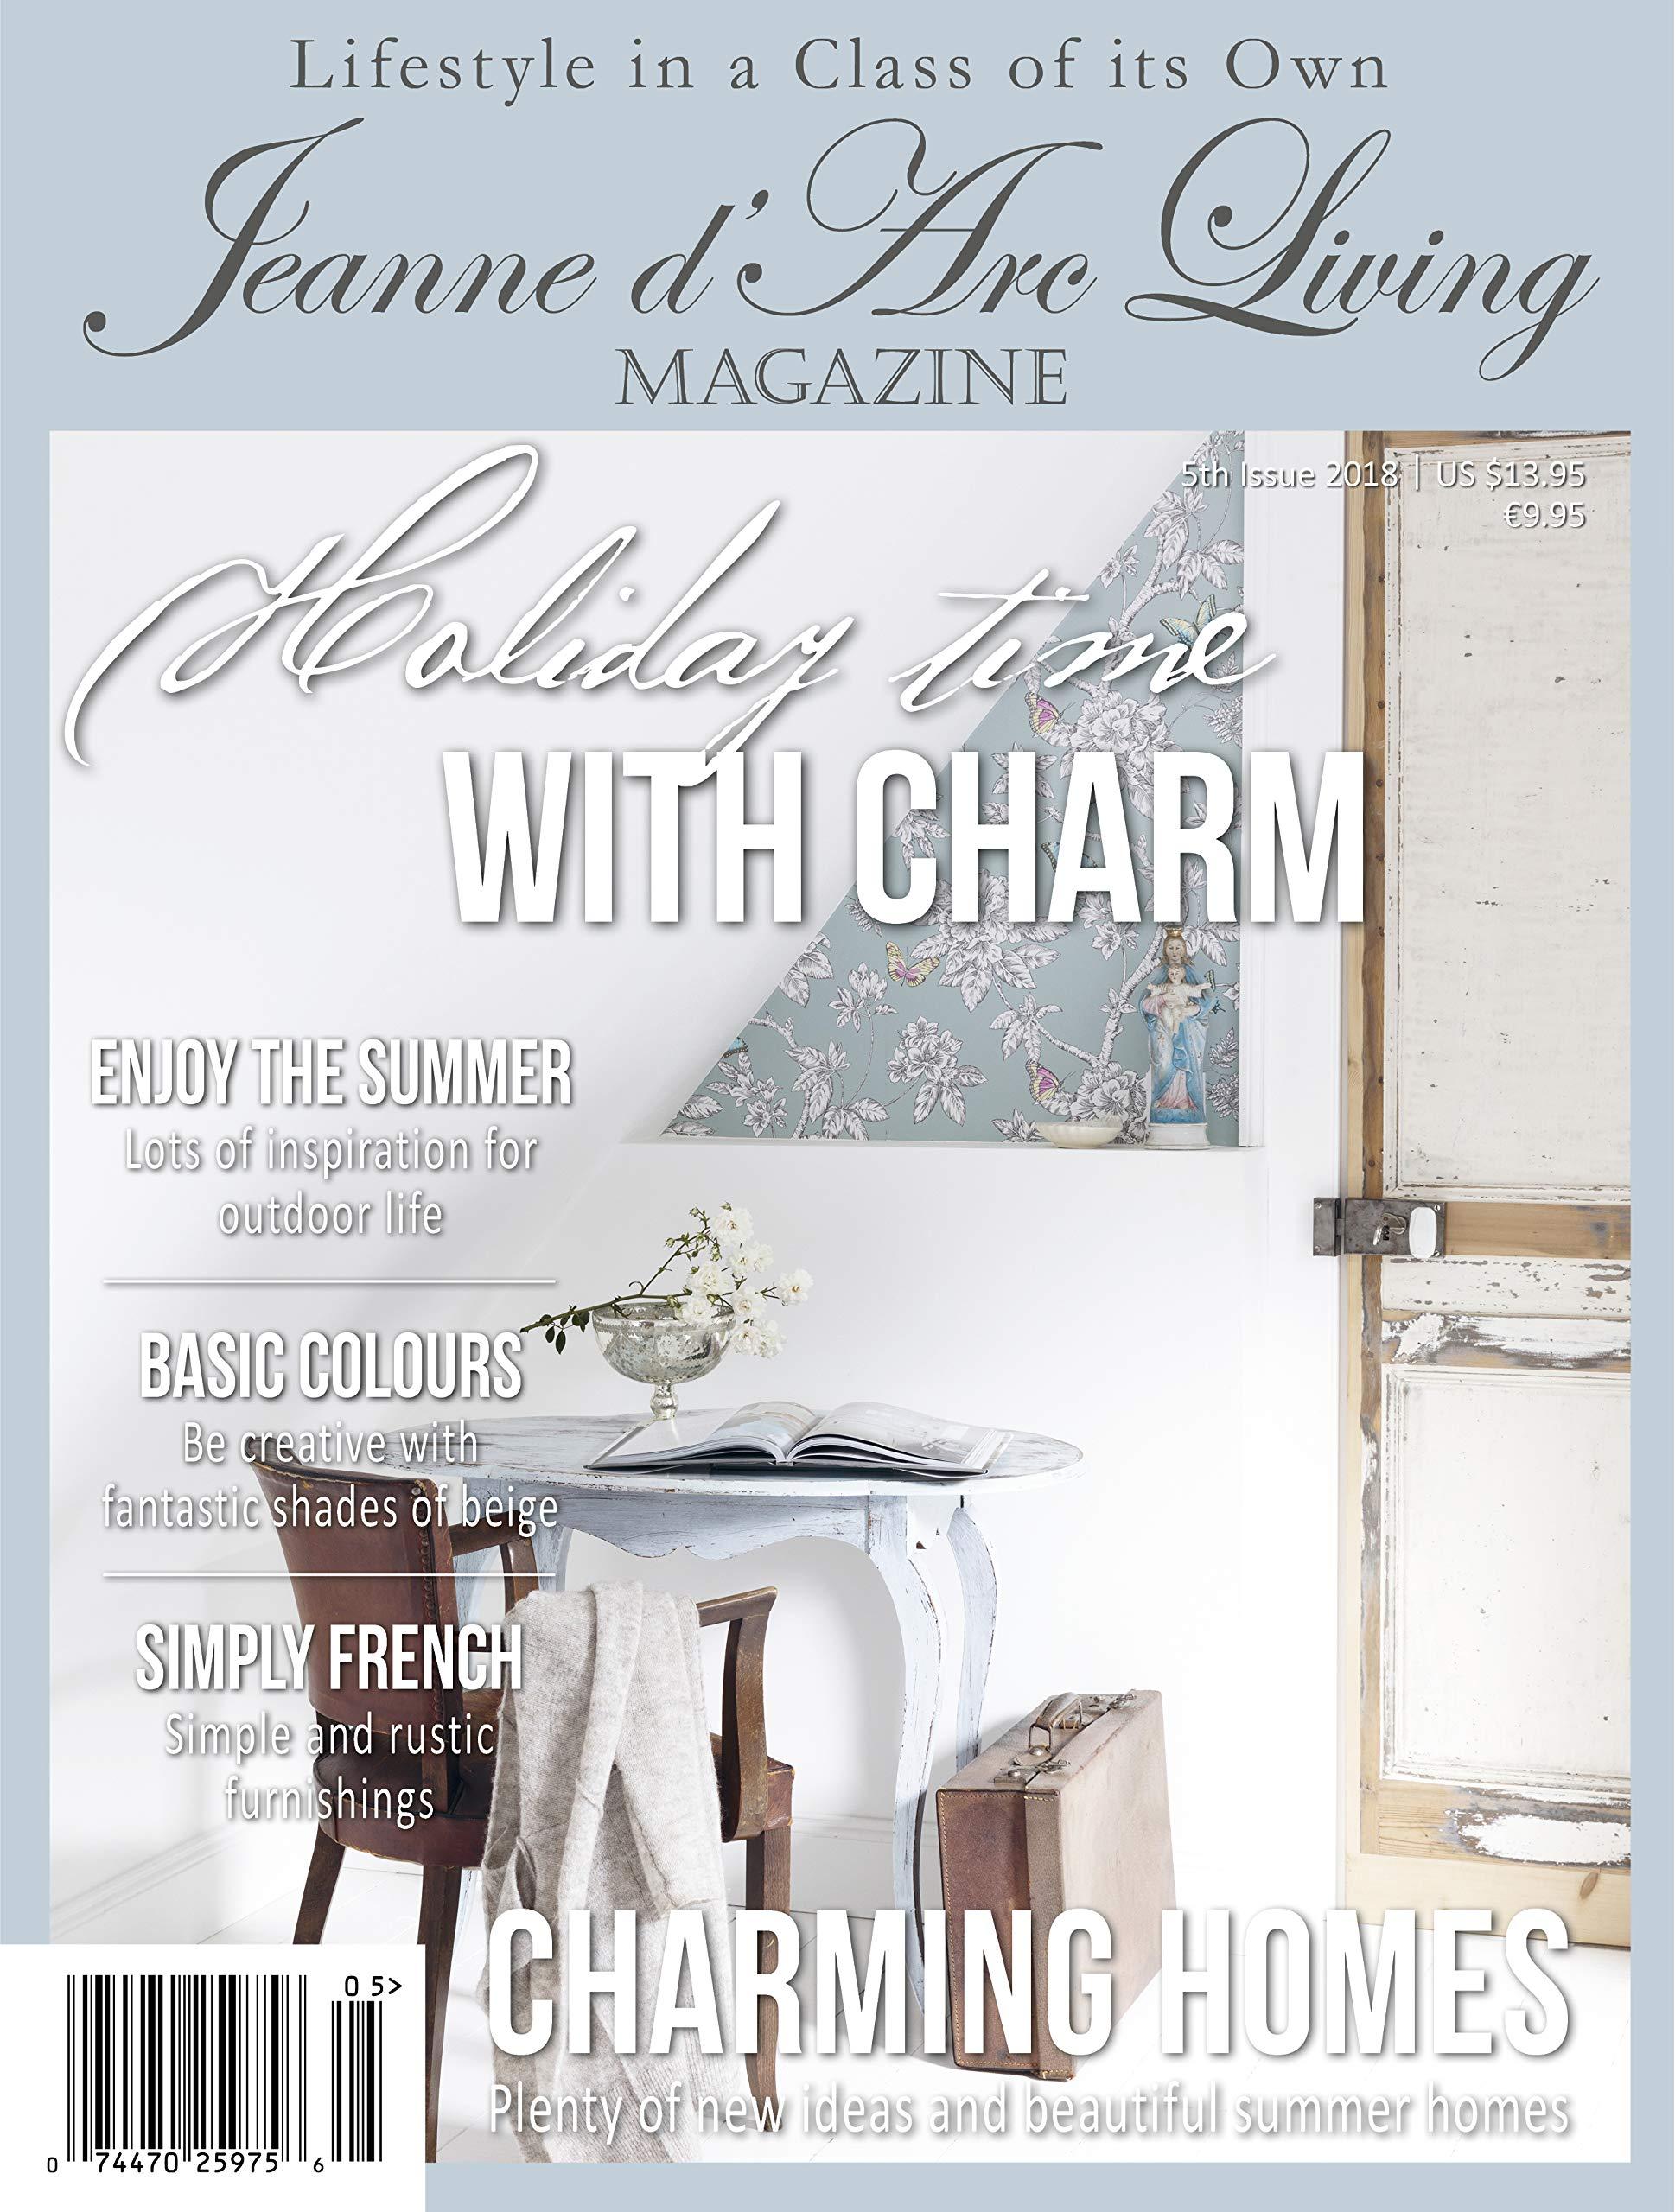 Jeanne d'arc Living magazine.